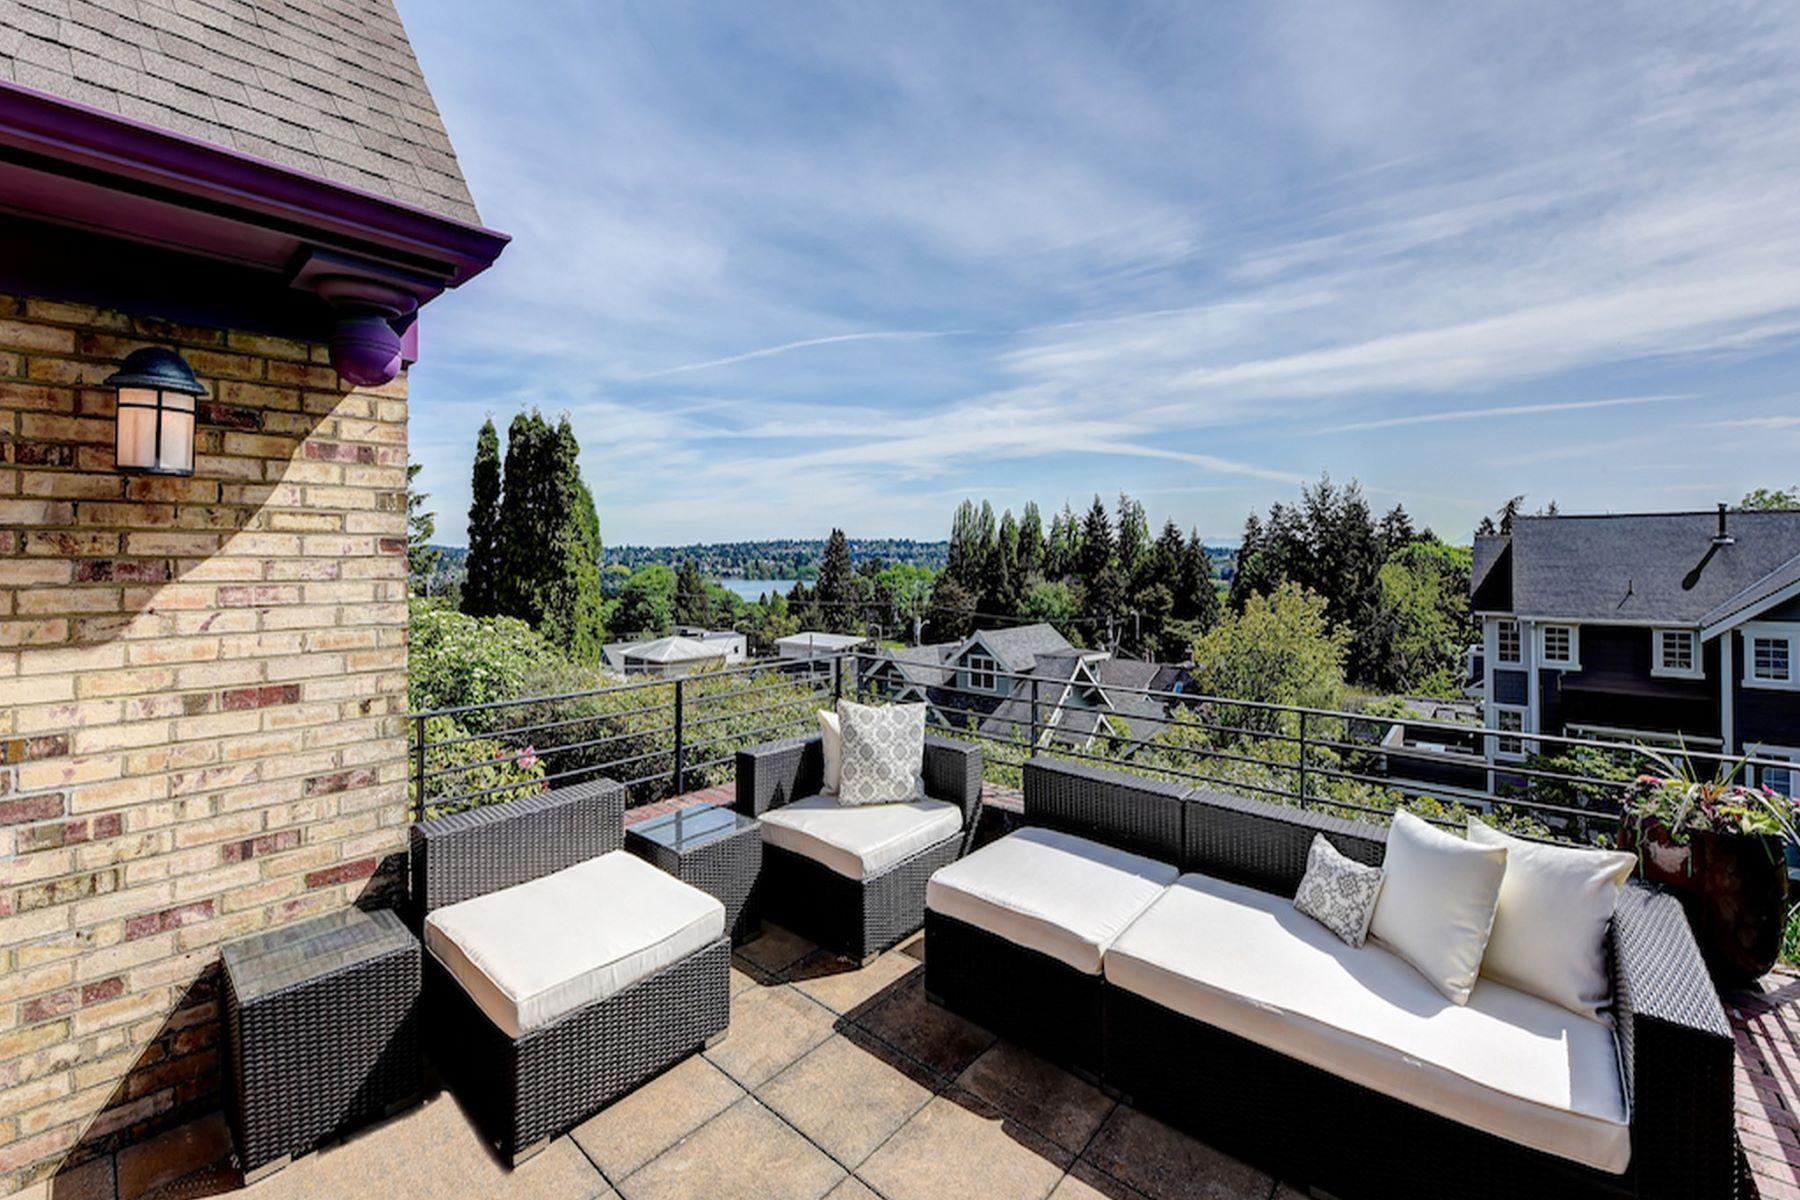 Additional photo for property listing at Renovated Woodland Park Craftsman 5907 Linden Ave N Seattle, Washington 98103 United States